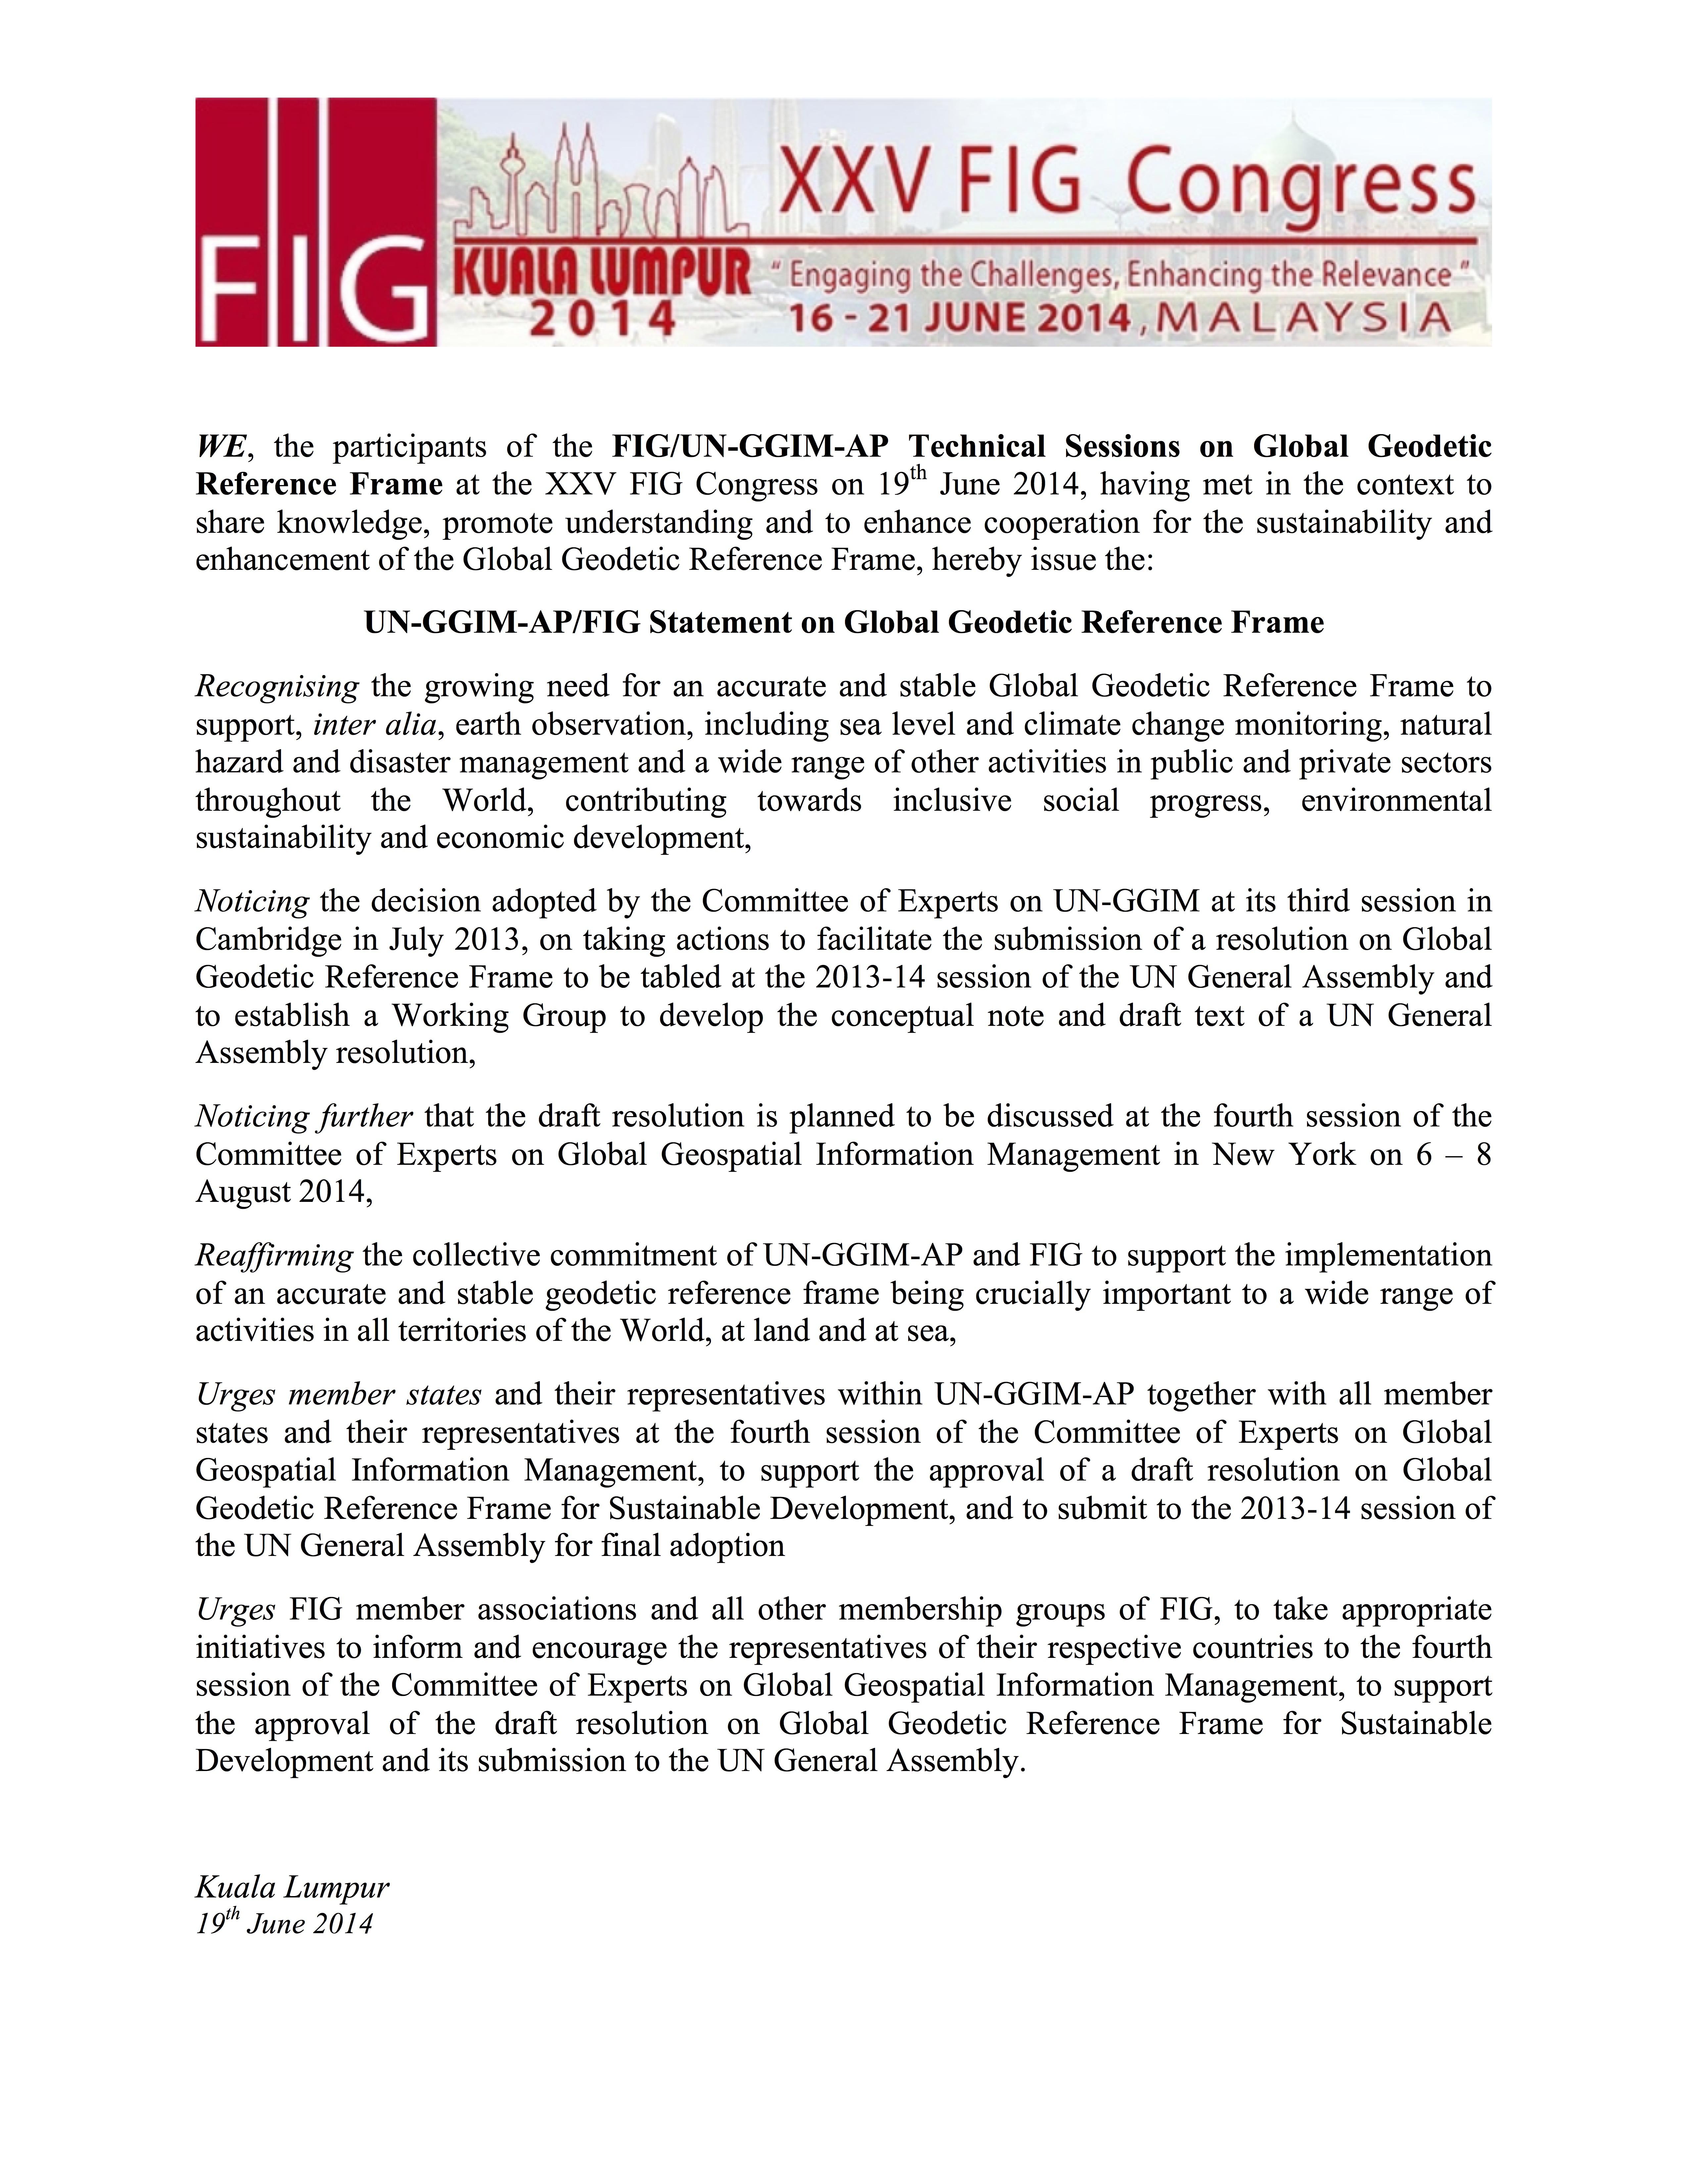 un ggim apfig statement on global geodetic reference frame